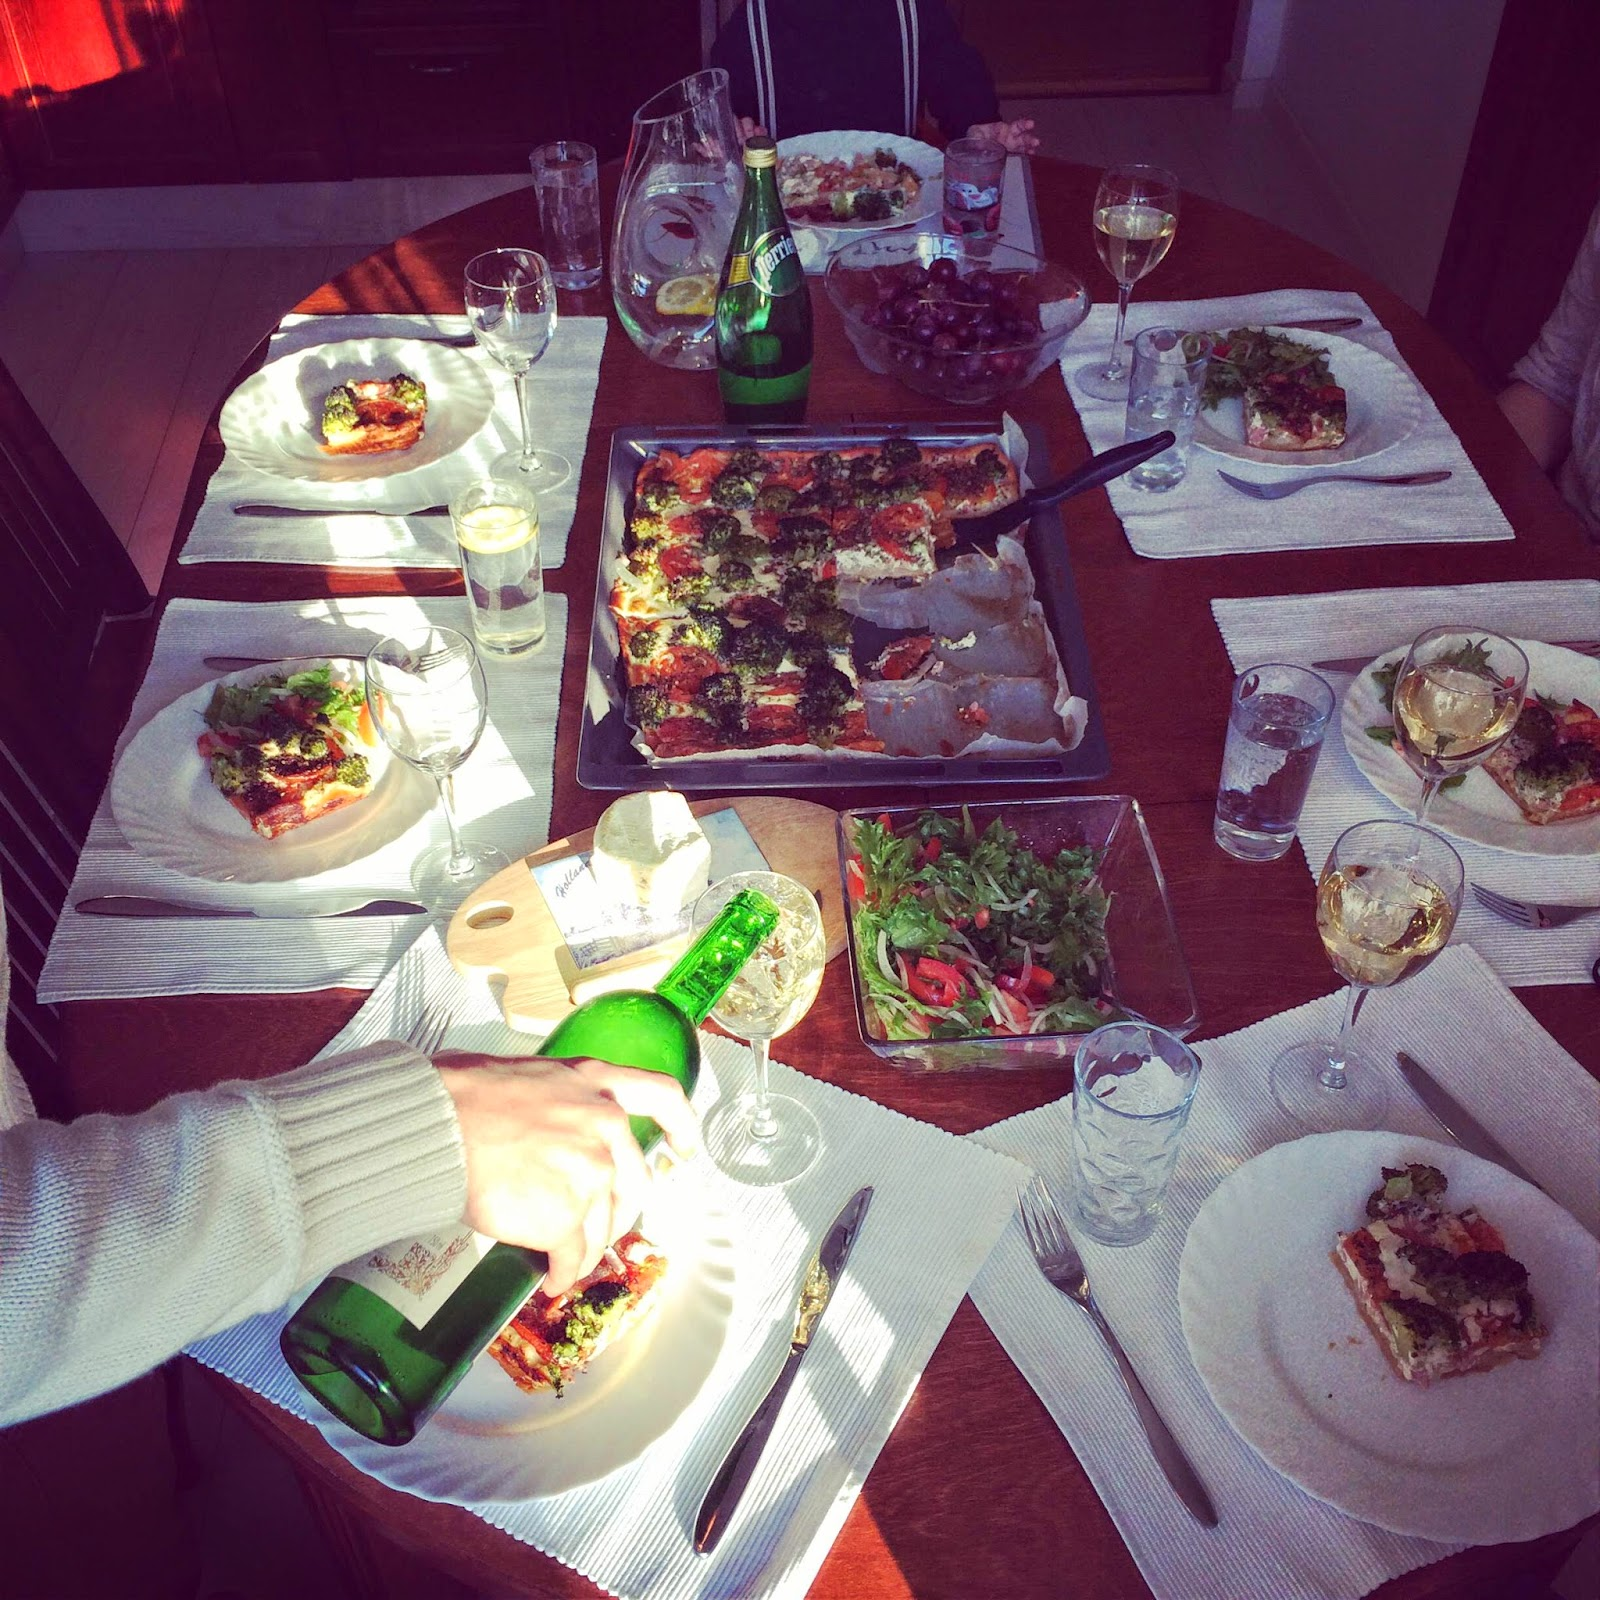 food-dinner-broccoli-pie